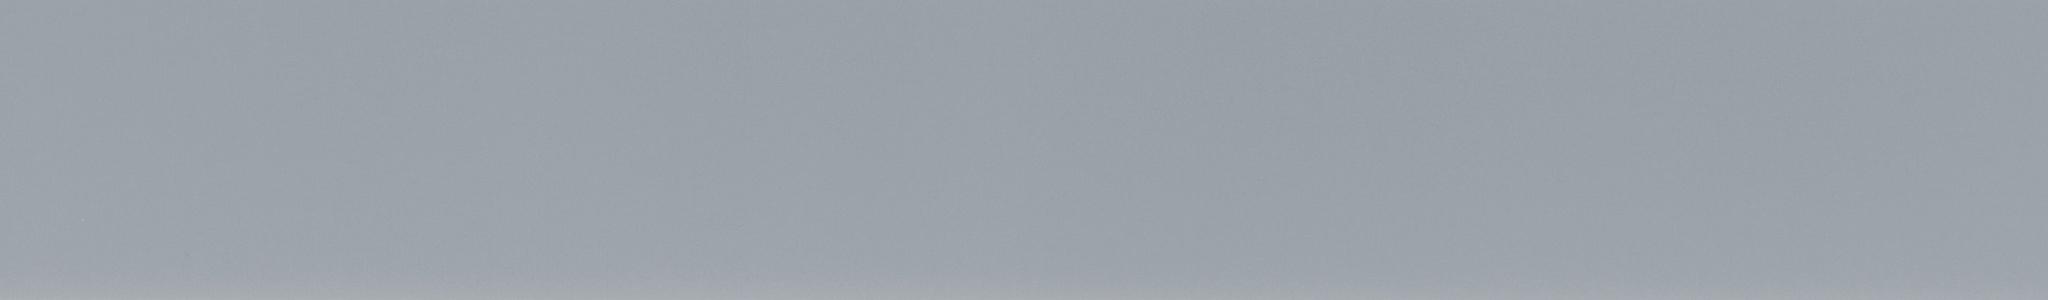 HU 17732 ABS hrana šedá hladká mat